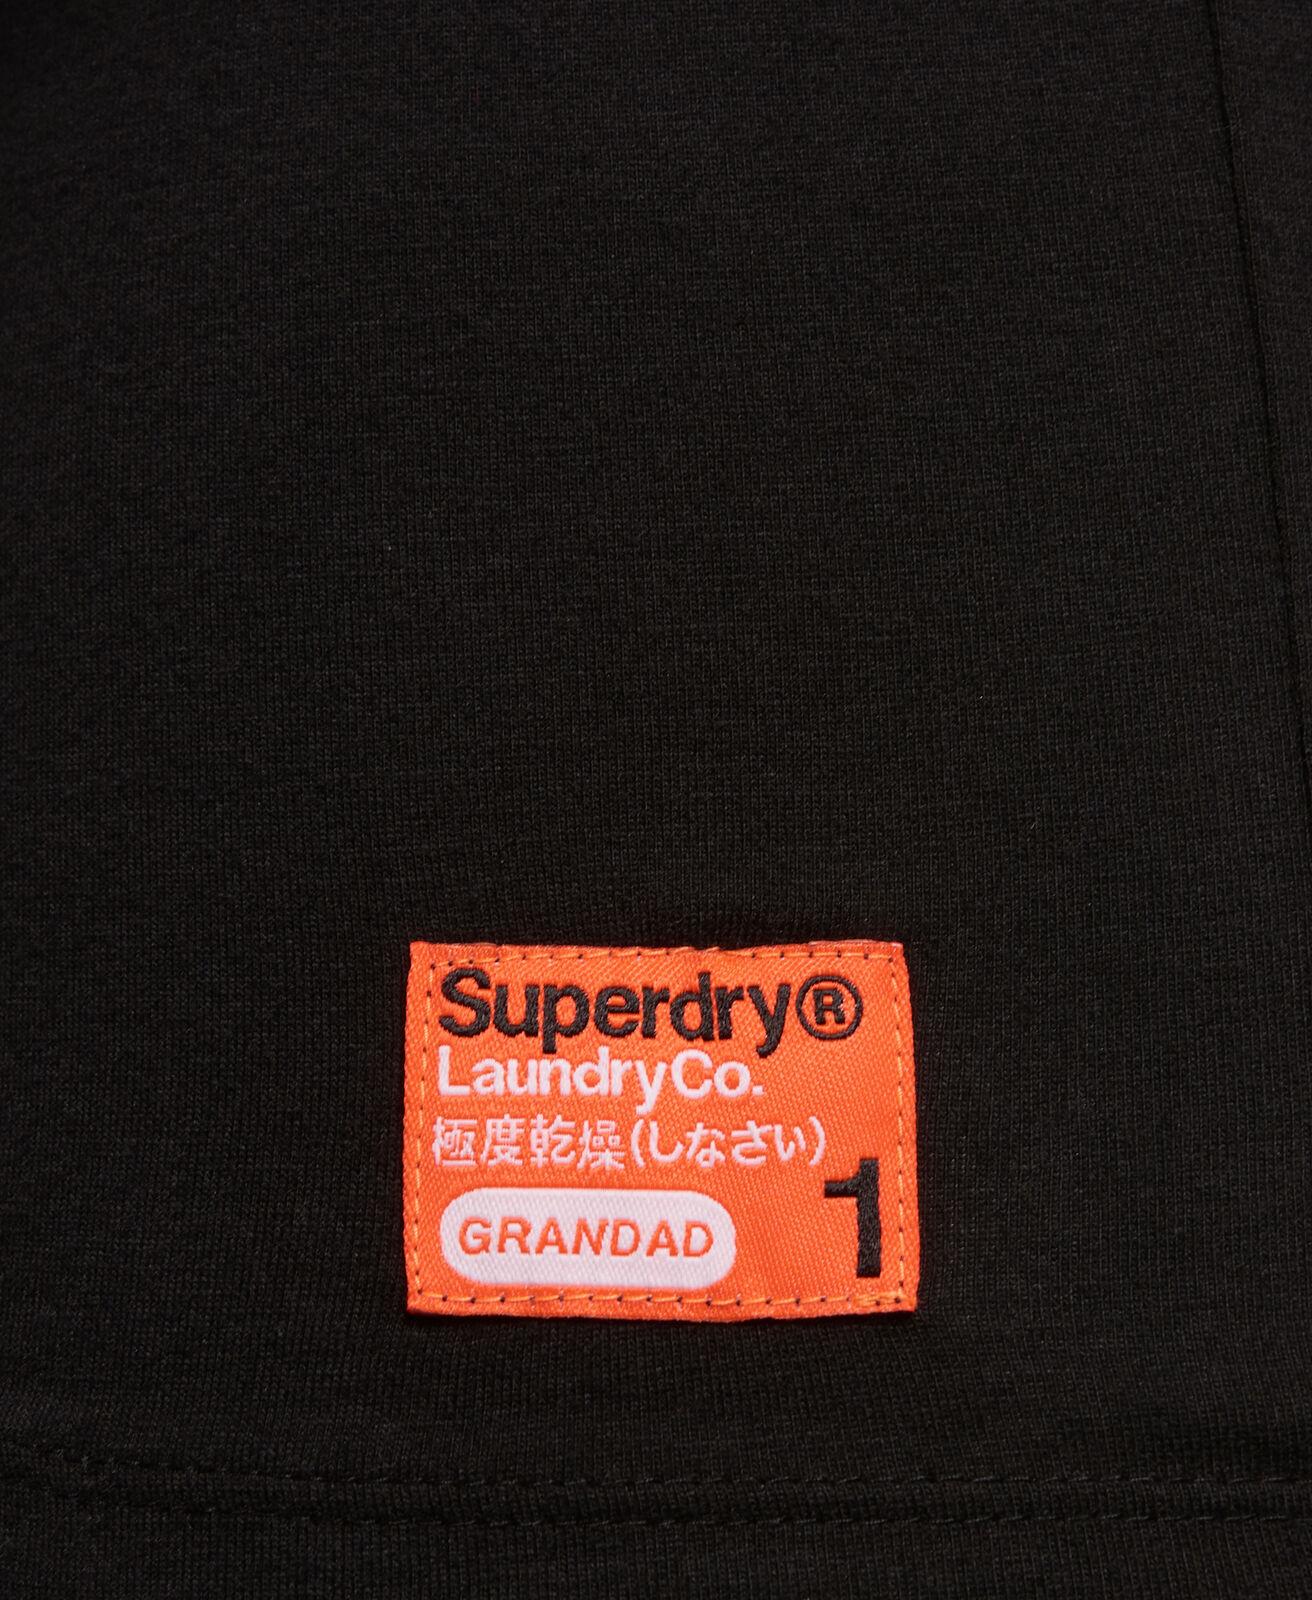 Mens-Superdry-Laundry-Organic-Cotton-Grandad-Top-Laundry-Black thumbnail 15